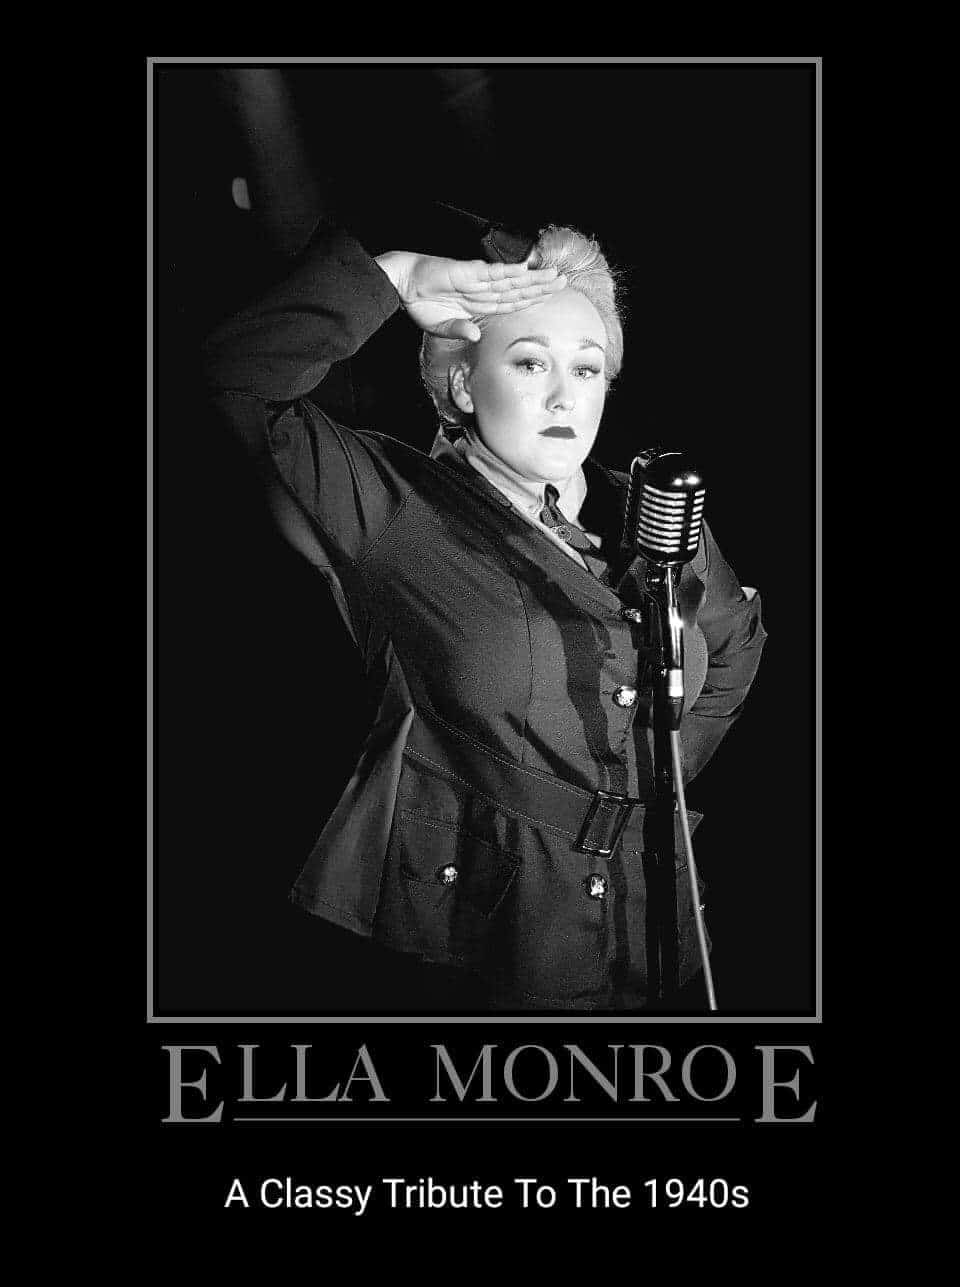 1940's Tribute Show by Ella Monroe